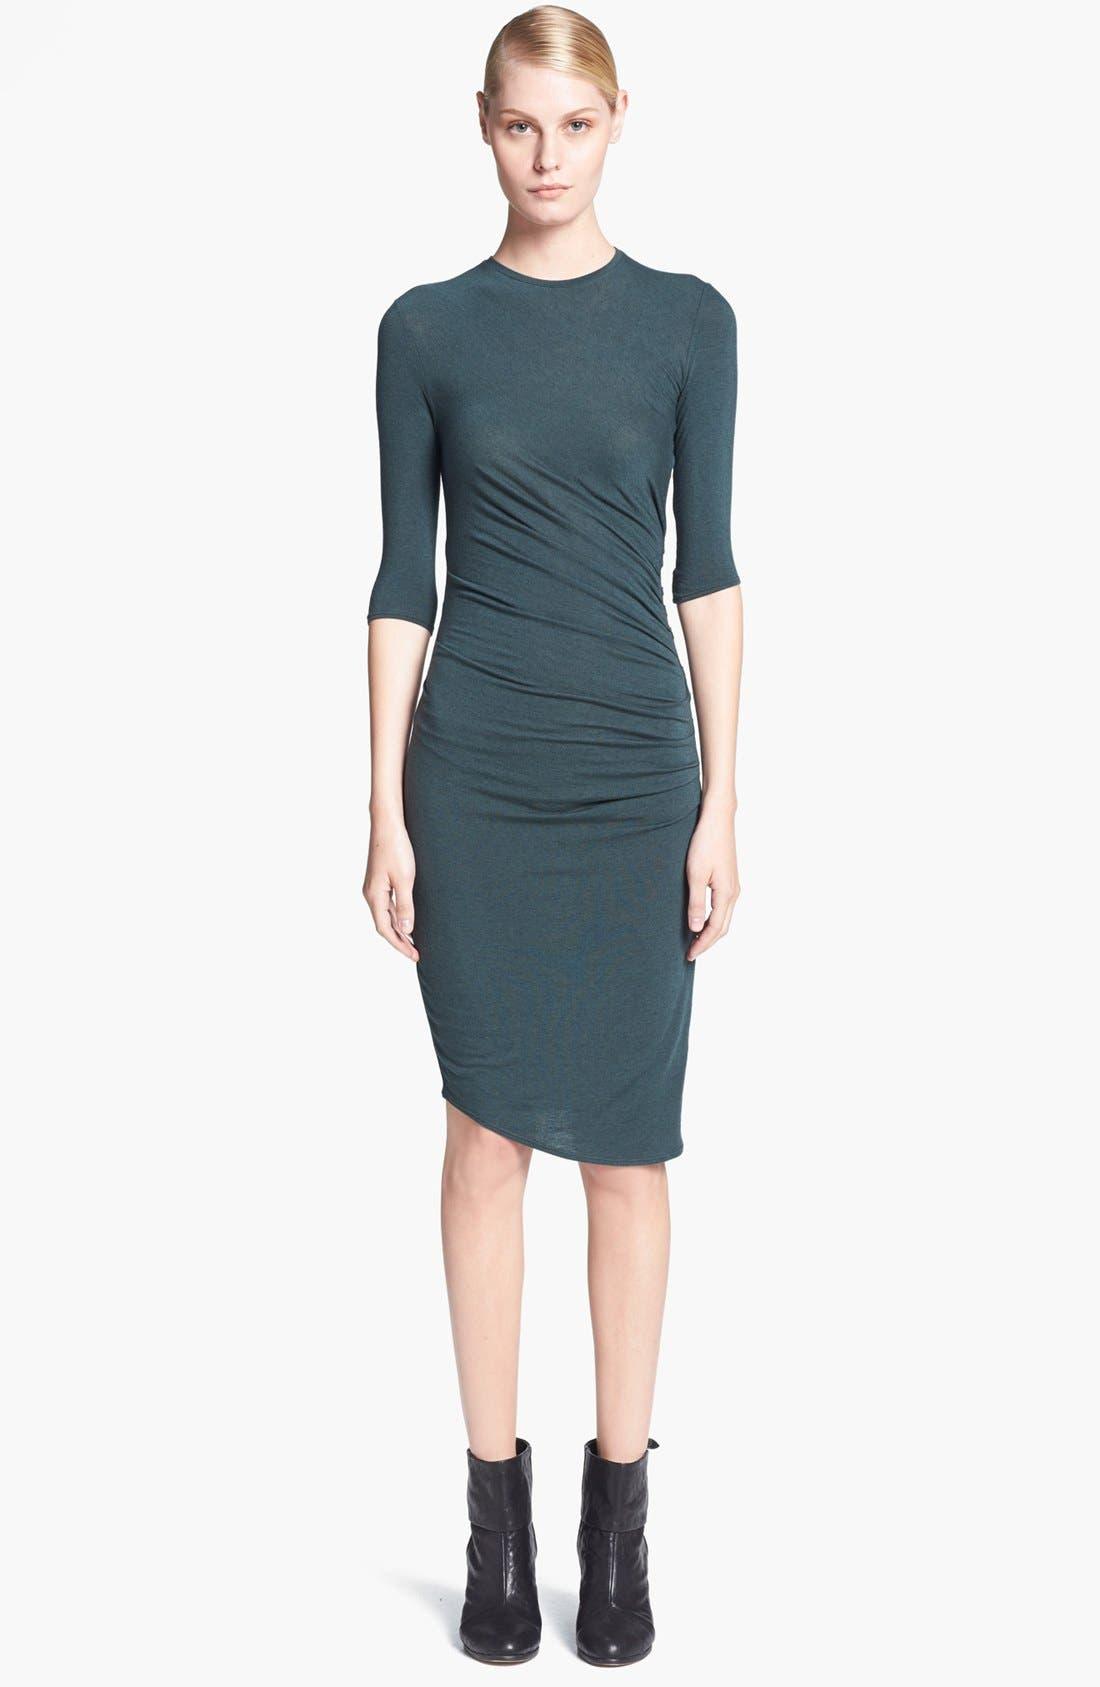 Main Image - HELMUT Helmut Lang 'Nova' Jersey Dress